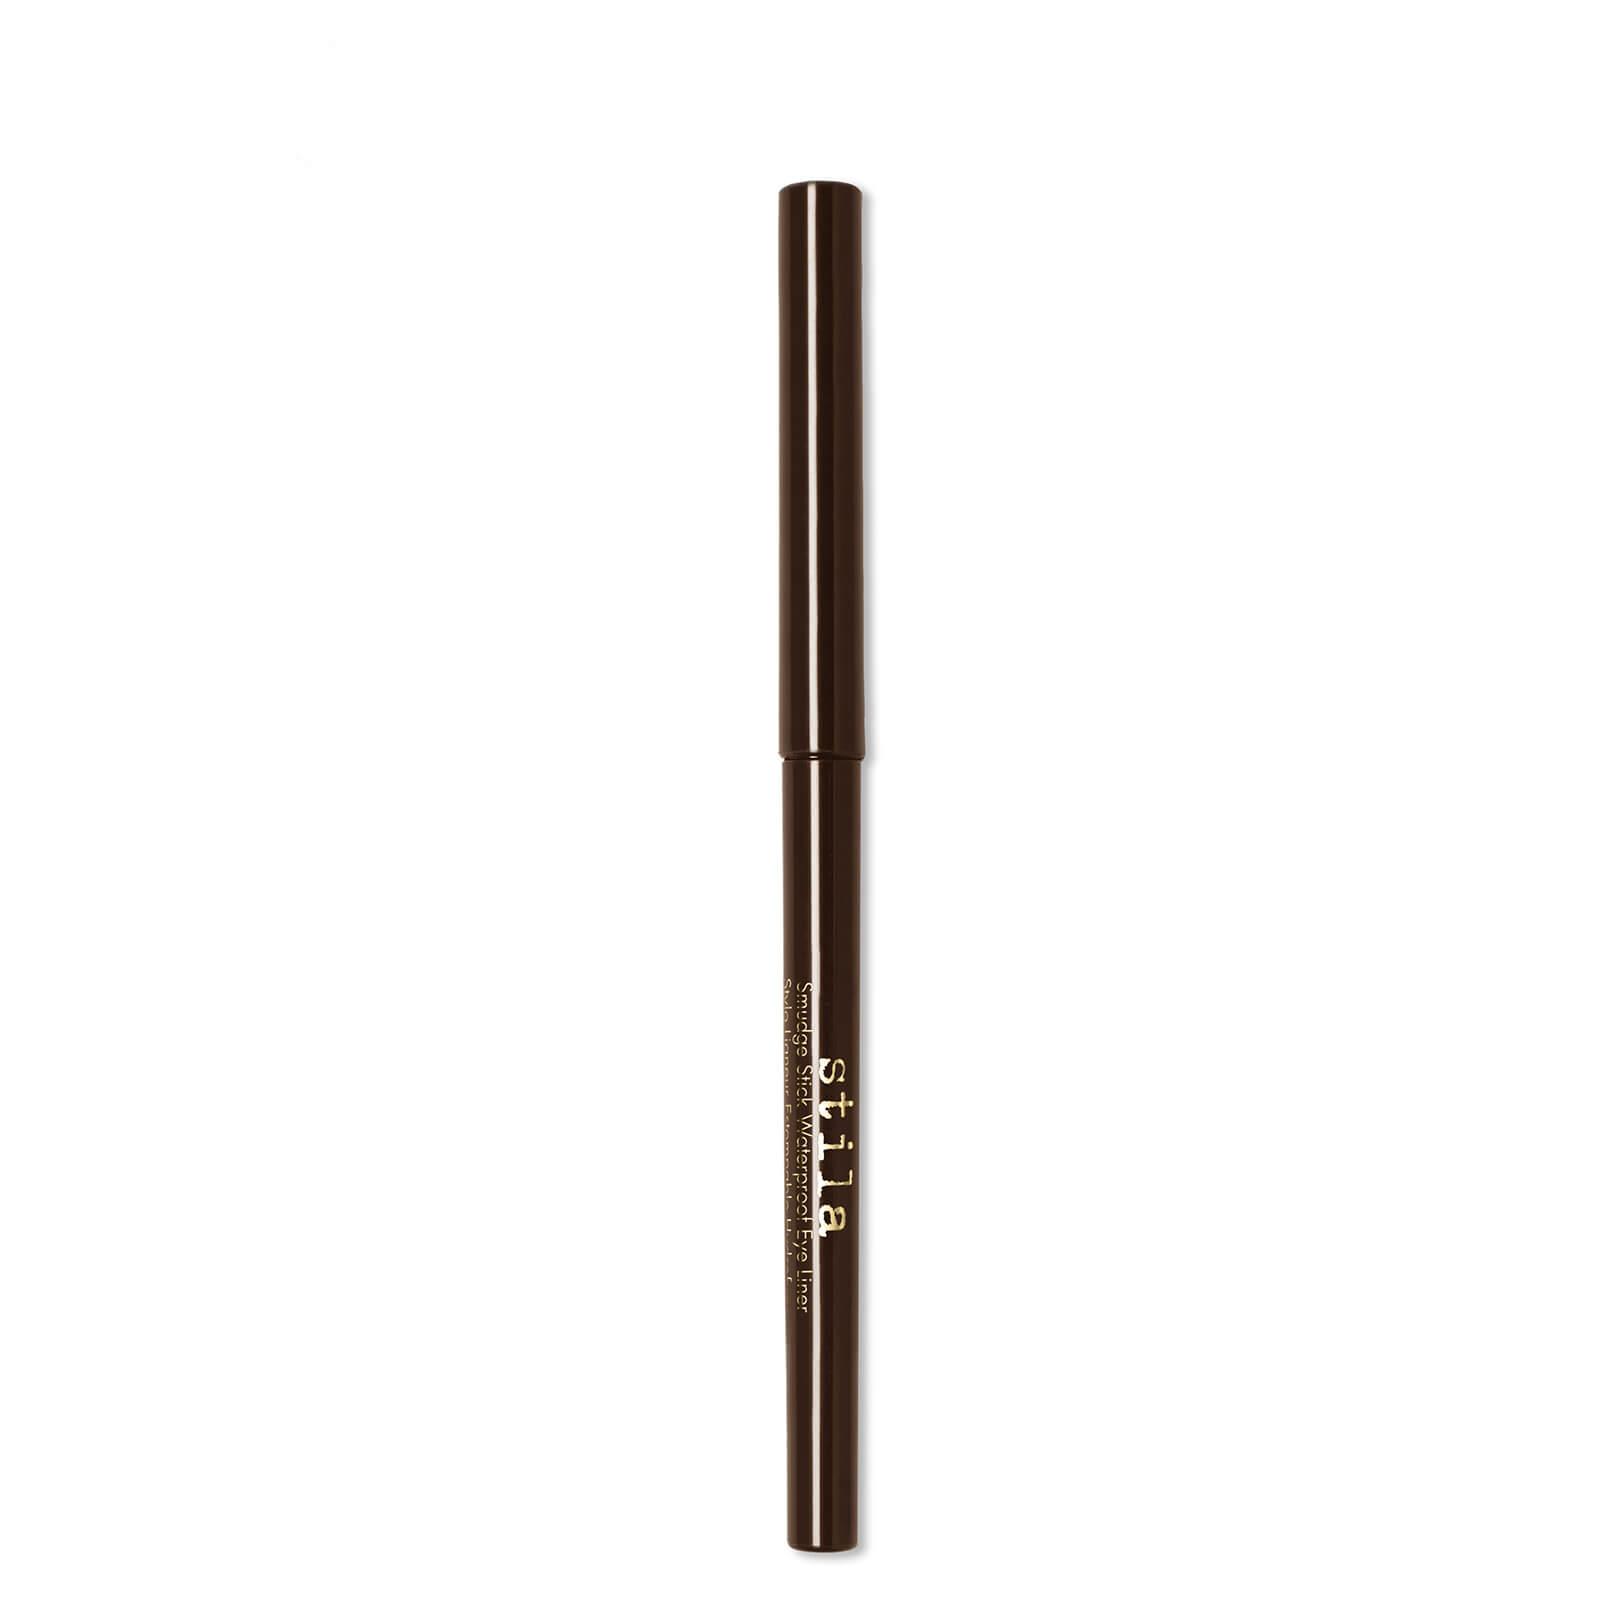 Купить Stila Smudge Stick Waterproof Eye Liner (Various Shades) - Vivid Smoky Quartz